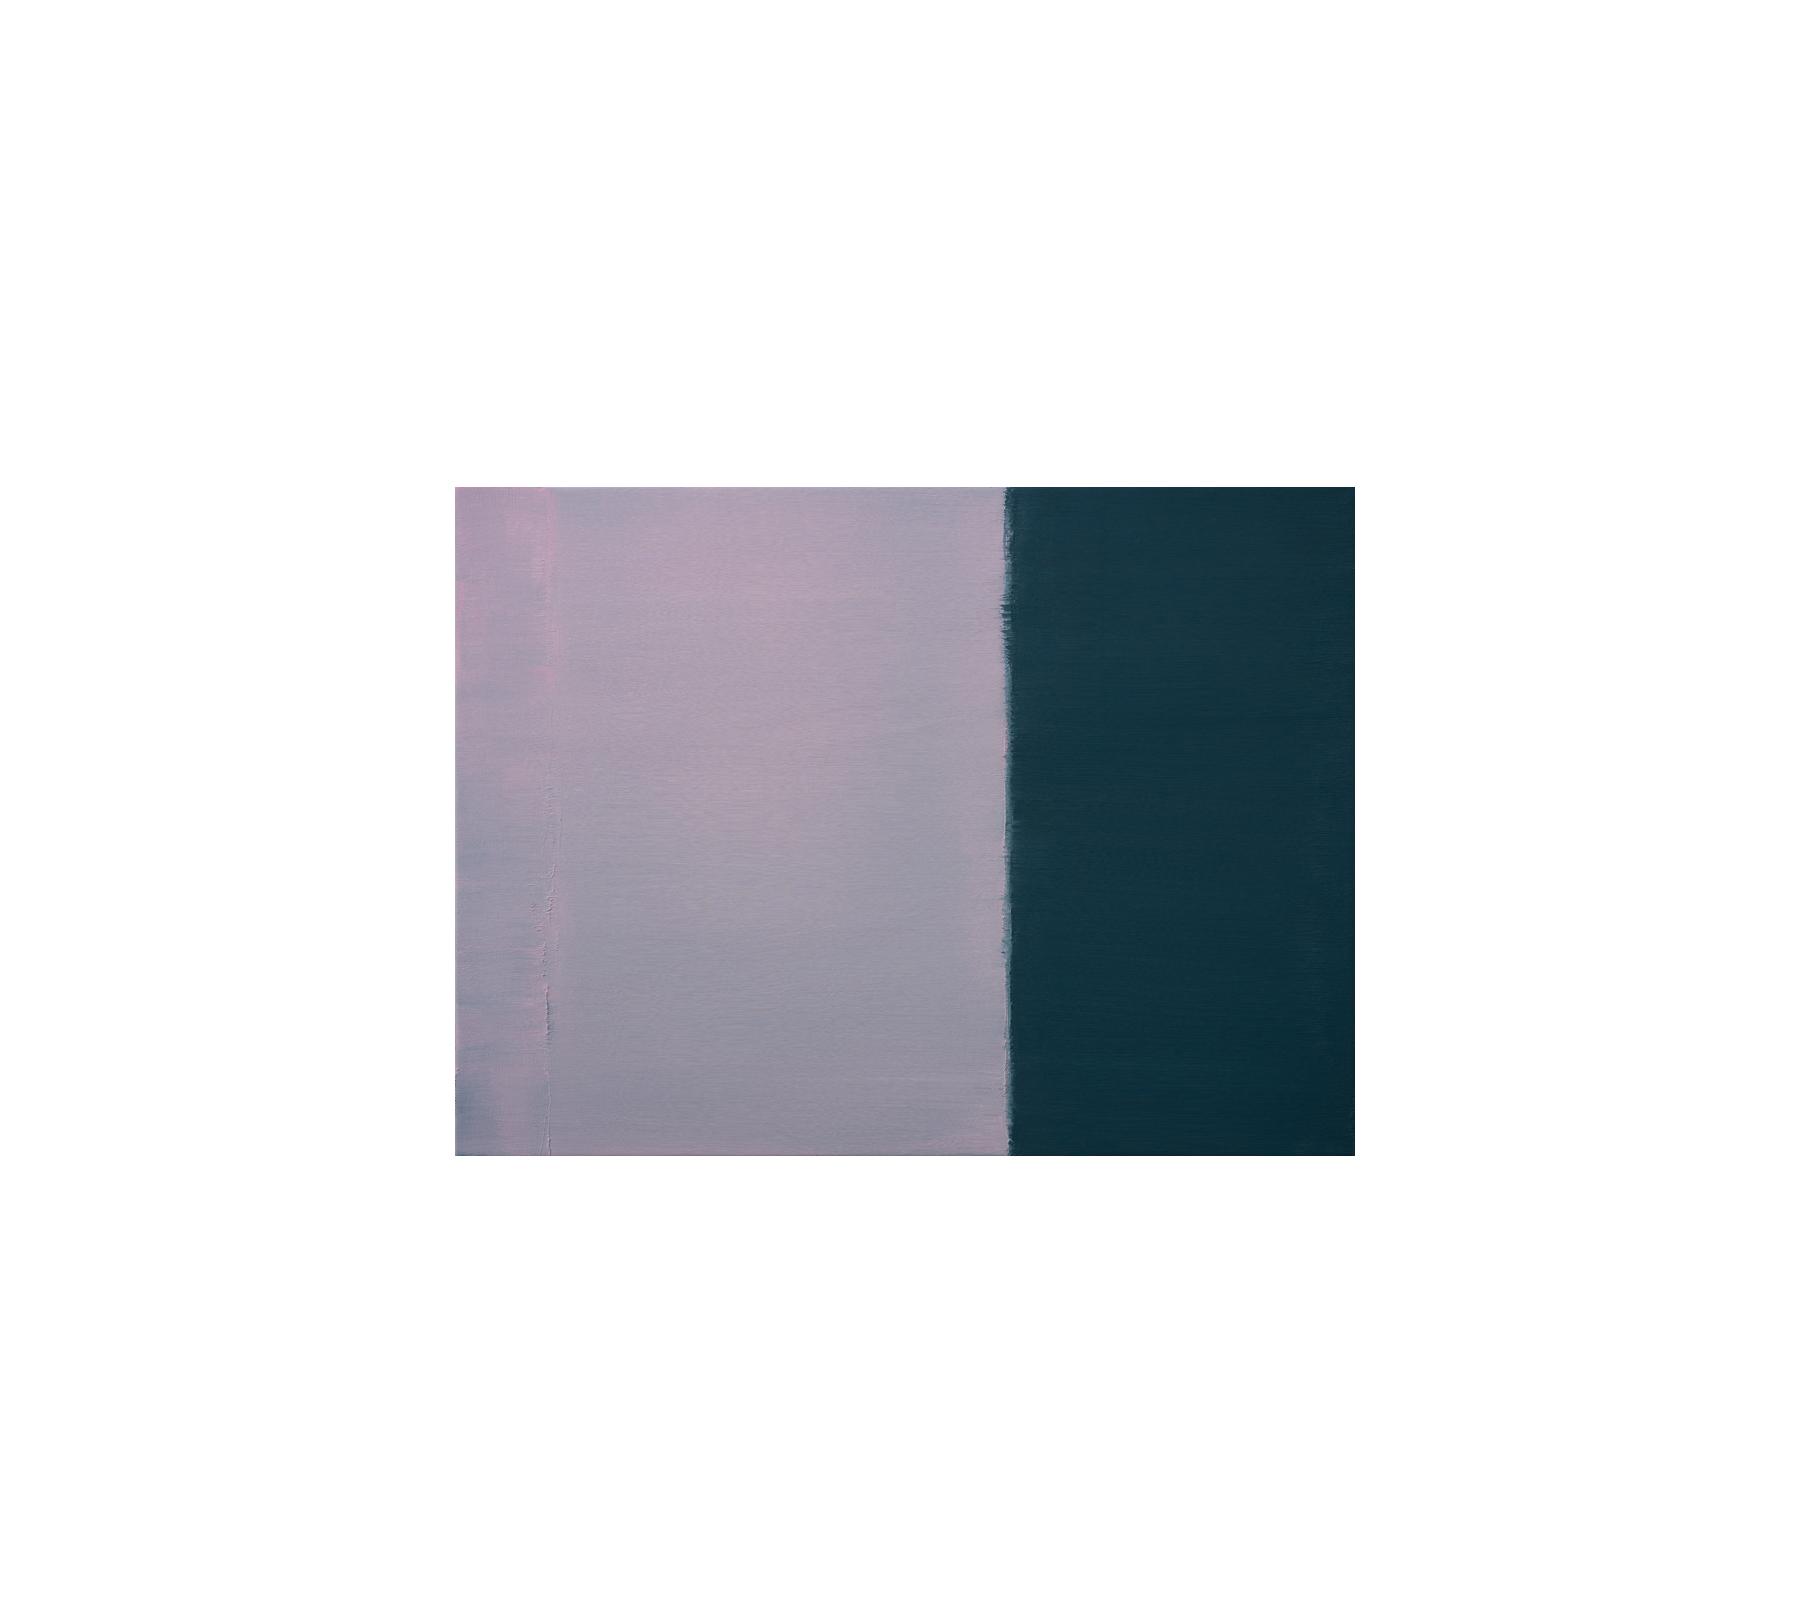 Untitled 2019 60x80cm